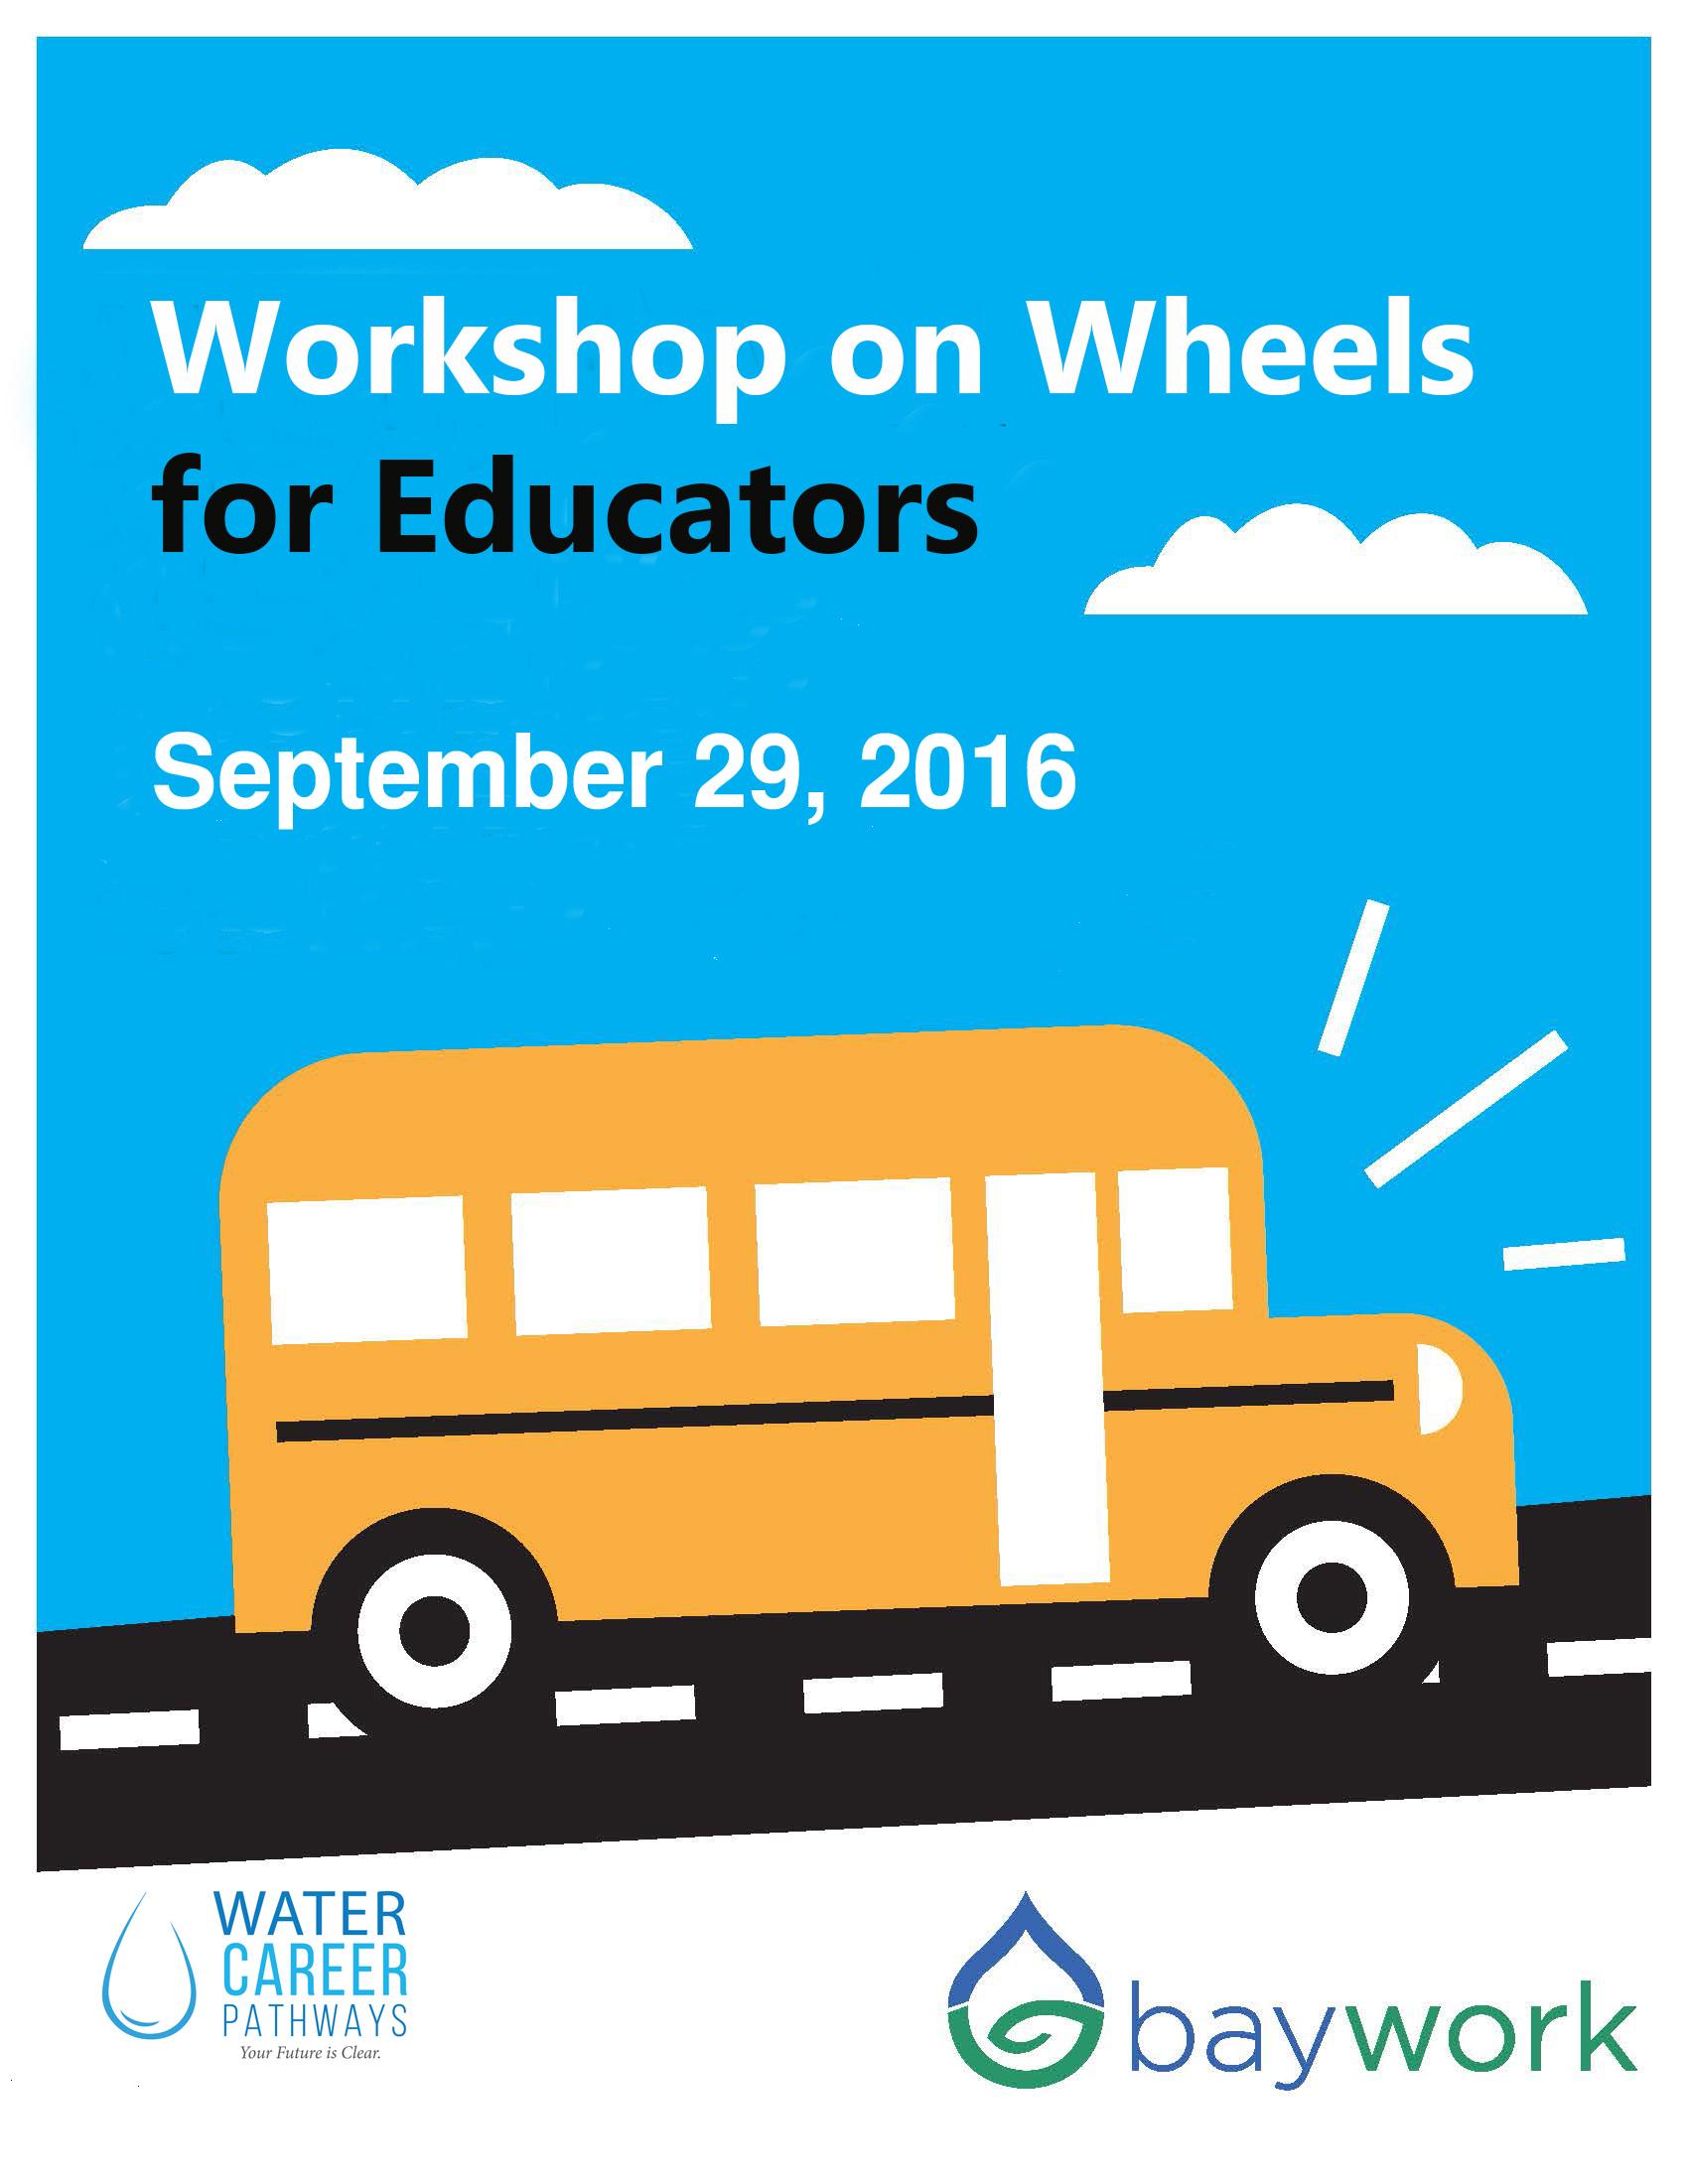 Workshop on Wheels for Educators Cover